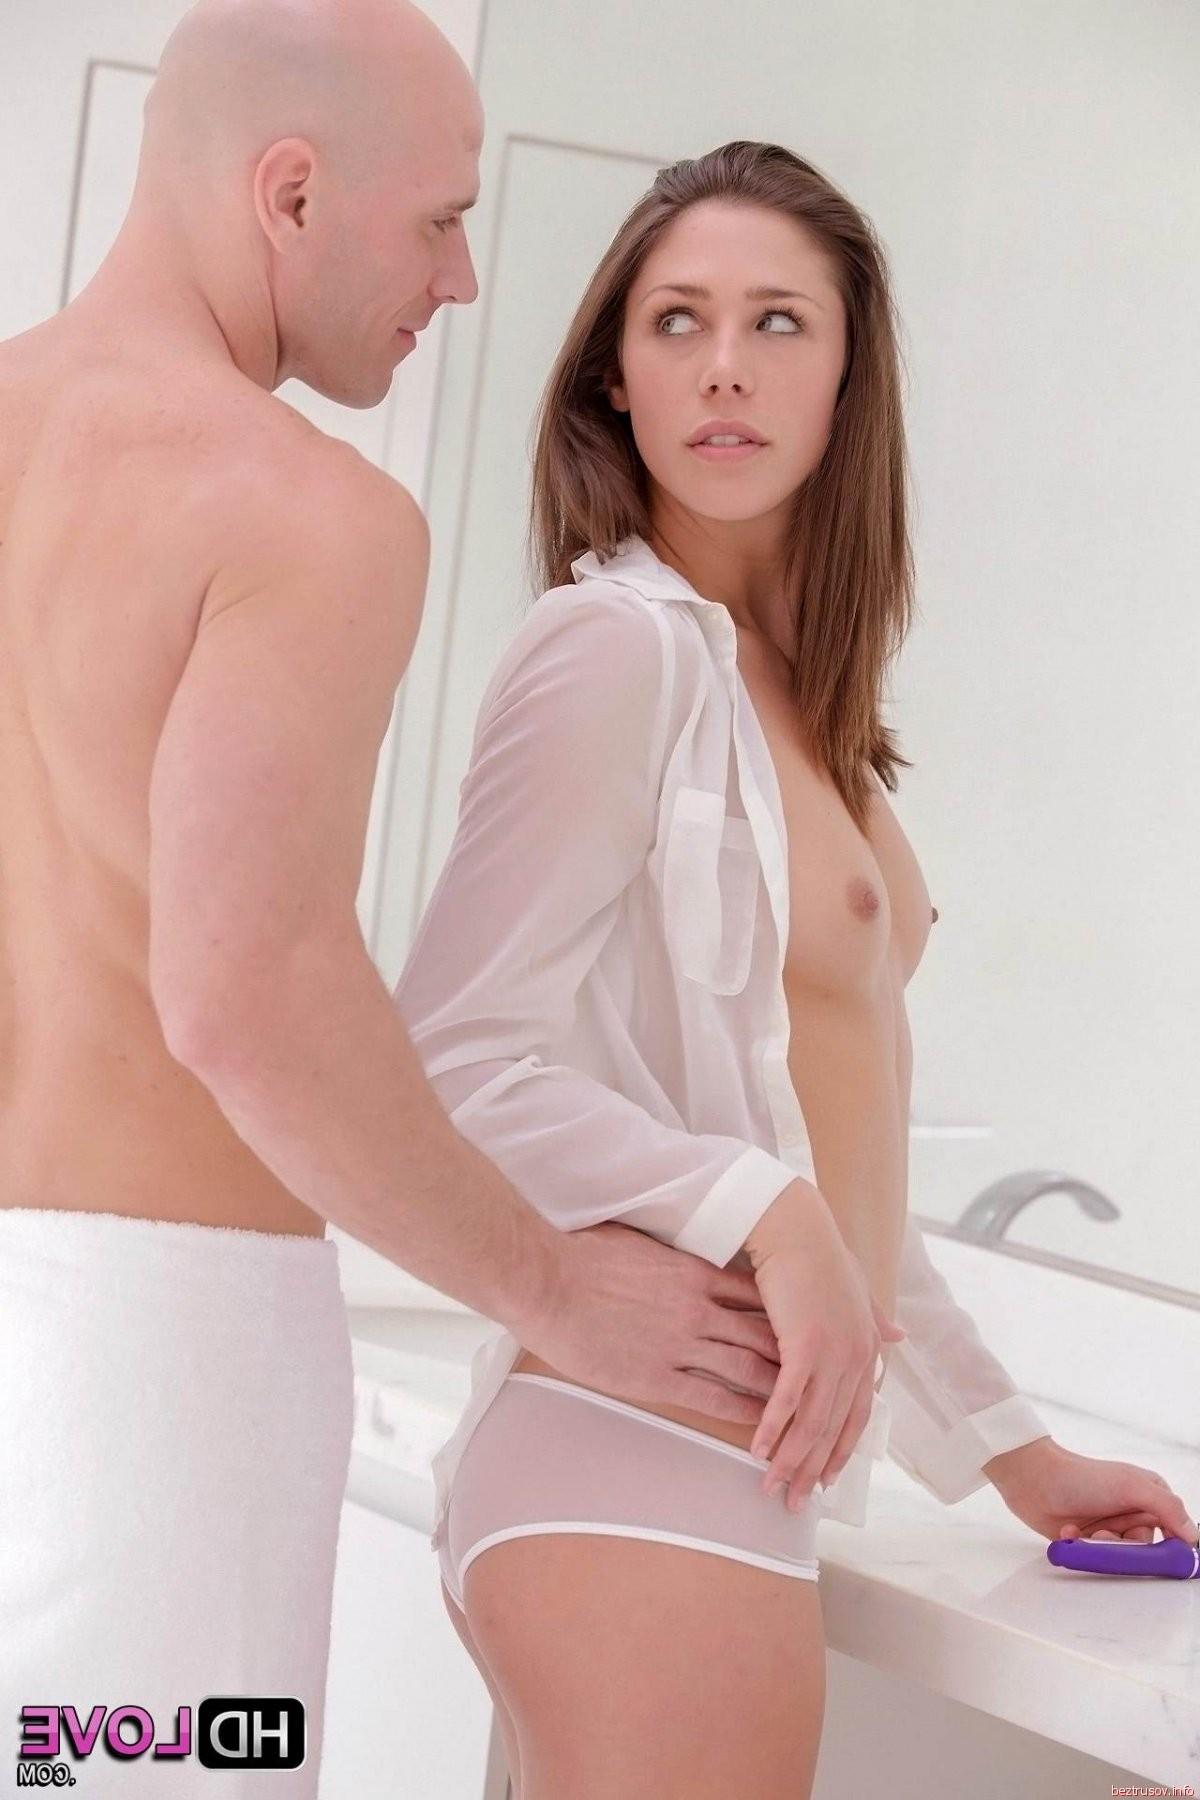 clitoris gallery size – Erotic